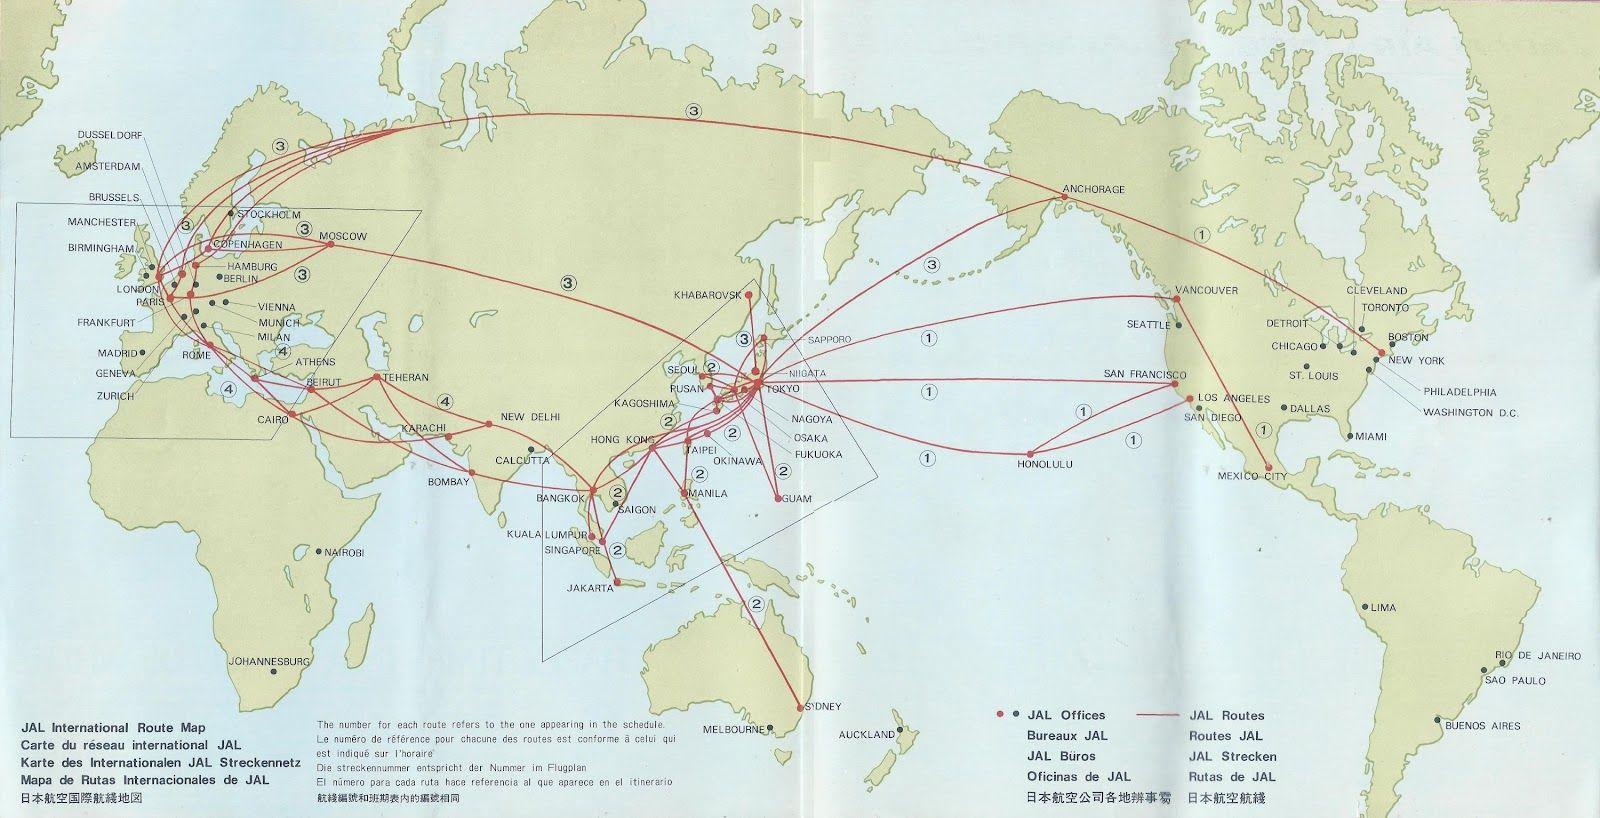 JAL Japan Air Lines route system map 1973 | Luftfahrt ... on united airlines route map, hawaiian airlines route map, israel airlines route map, american airlines route map, singapore airlines route map, canadian airlines route map, mokulele airlines route map, shanghai airlines route map, korean air route map, aeroflot airline route map, northwest airlines route map, lufthansa route map, garuda route map, lan airlines route map, seaport airlines route map, malaysia airlines route map, atlantic coast airlines route map, syrian airlines route map, pakistan airlines route map, hawaiian airlines hubs map,